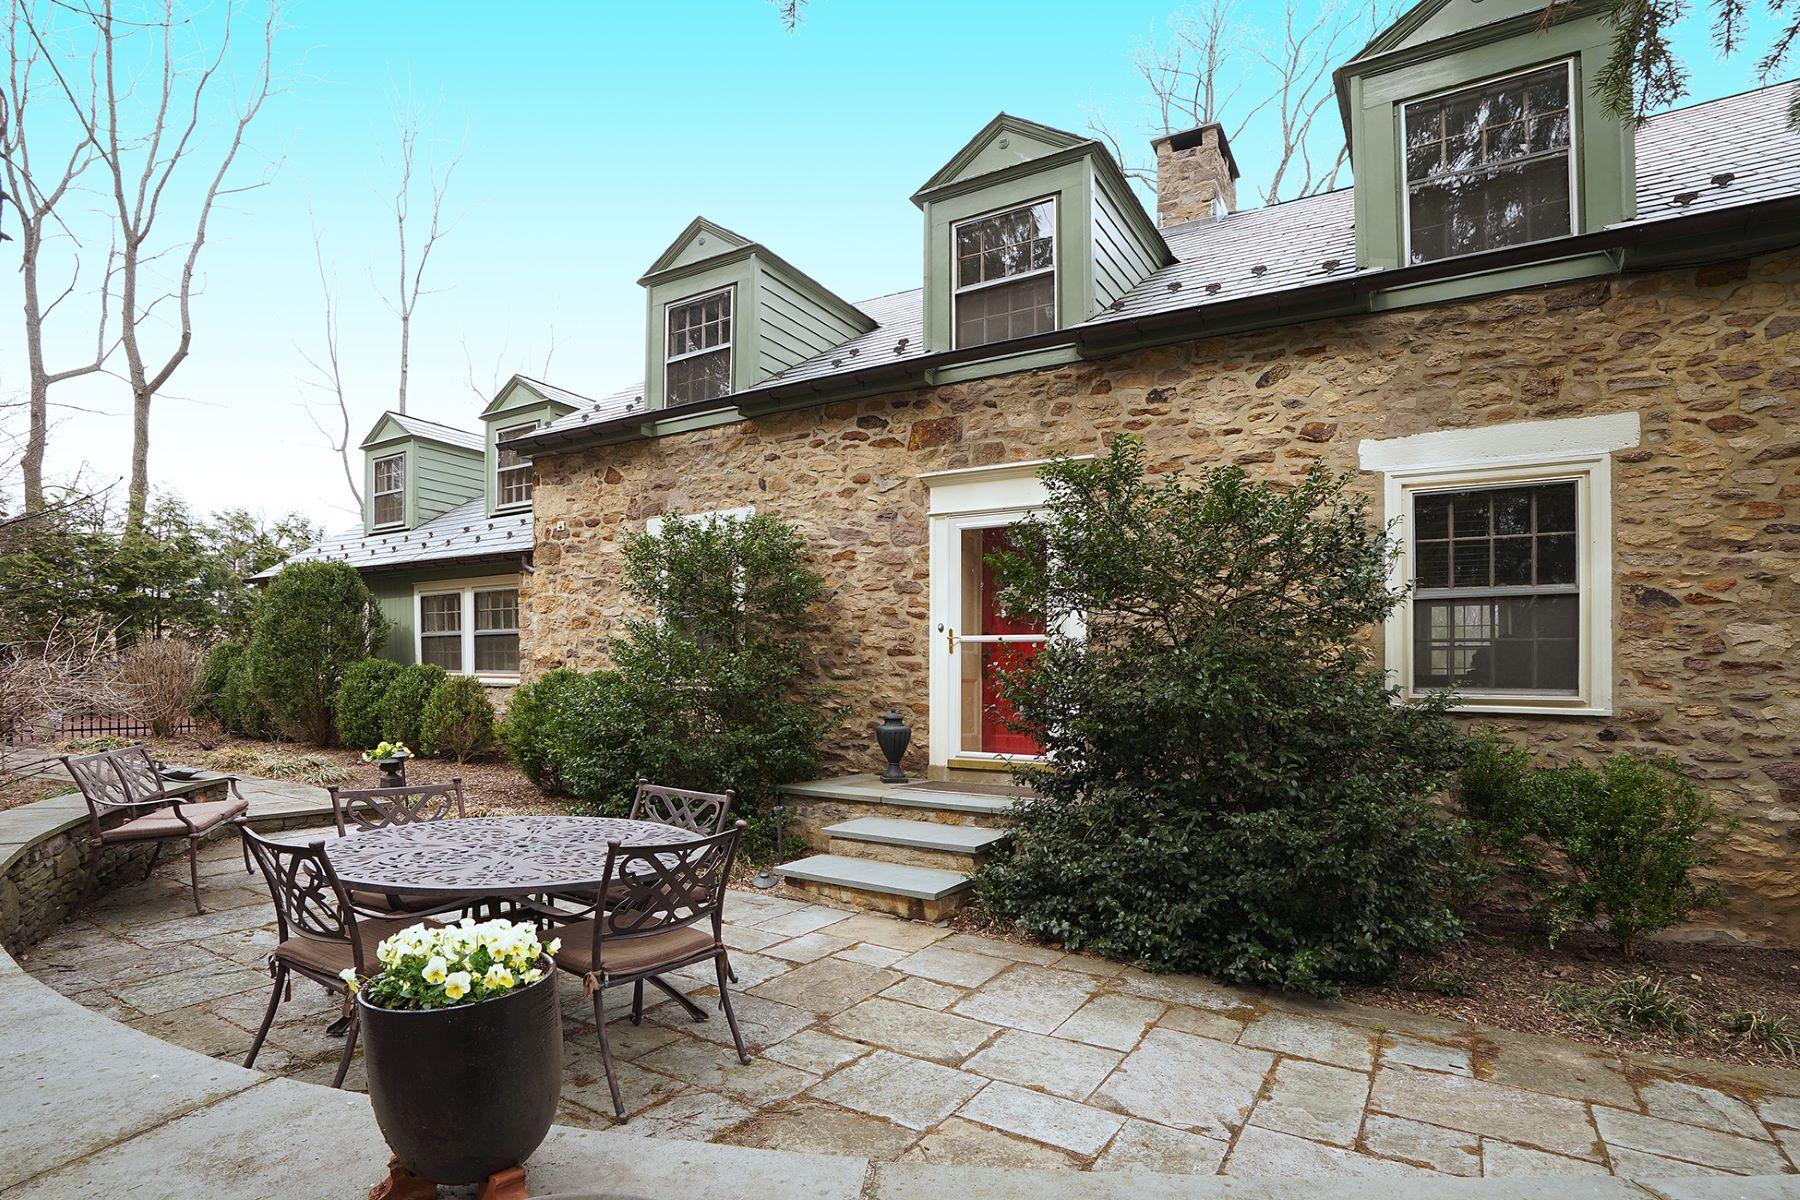 Single Family Home for Sale at Converted School House, circa 1857 3157 Church School Road, Doylestown, Pennsylvania 18902 United StatesMunicipality: Buckingham Township